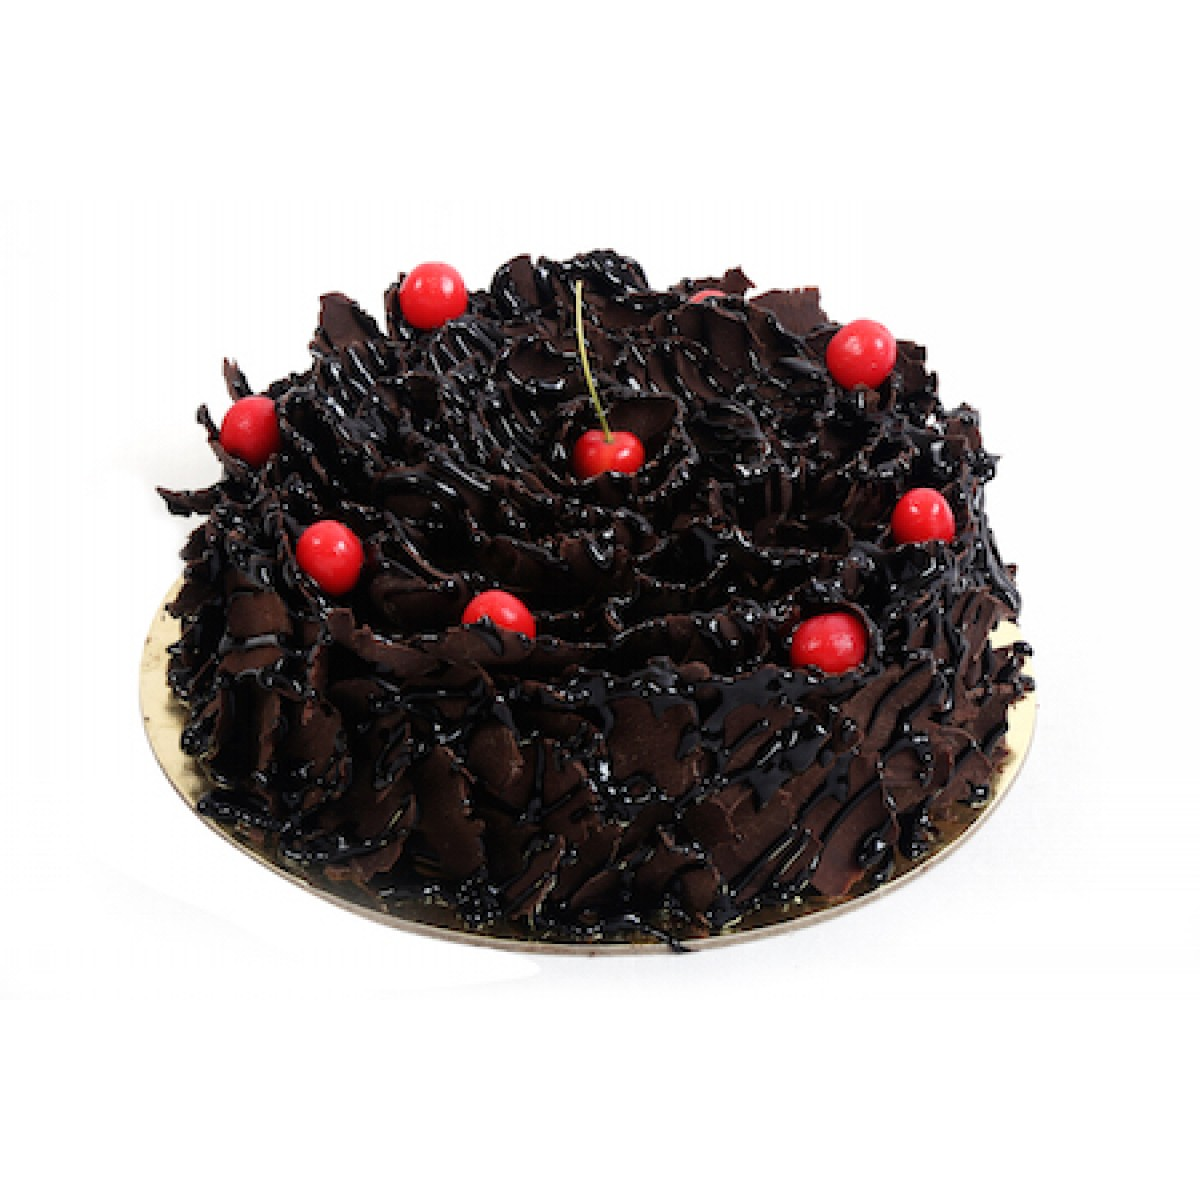 Chocolate Imagination Cake